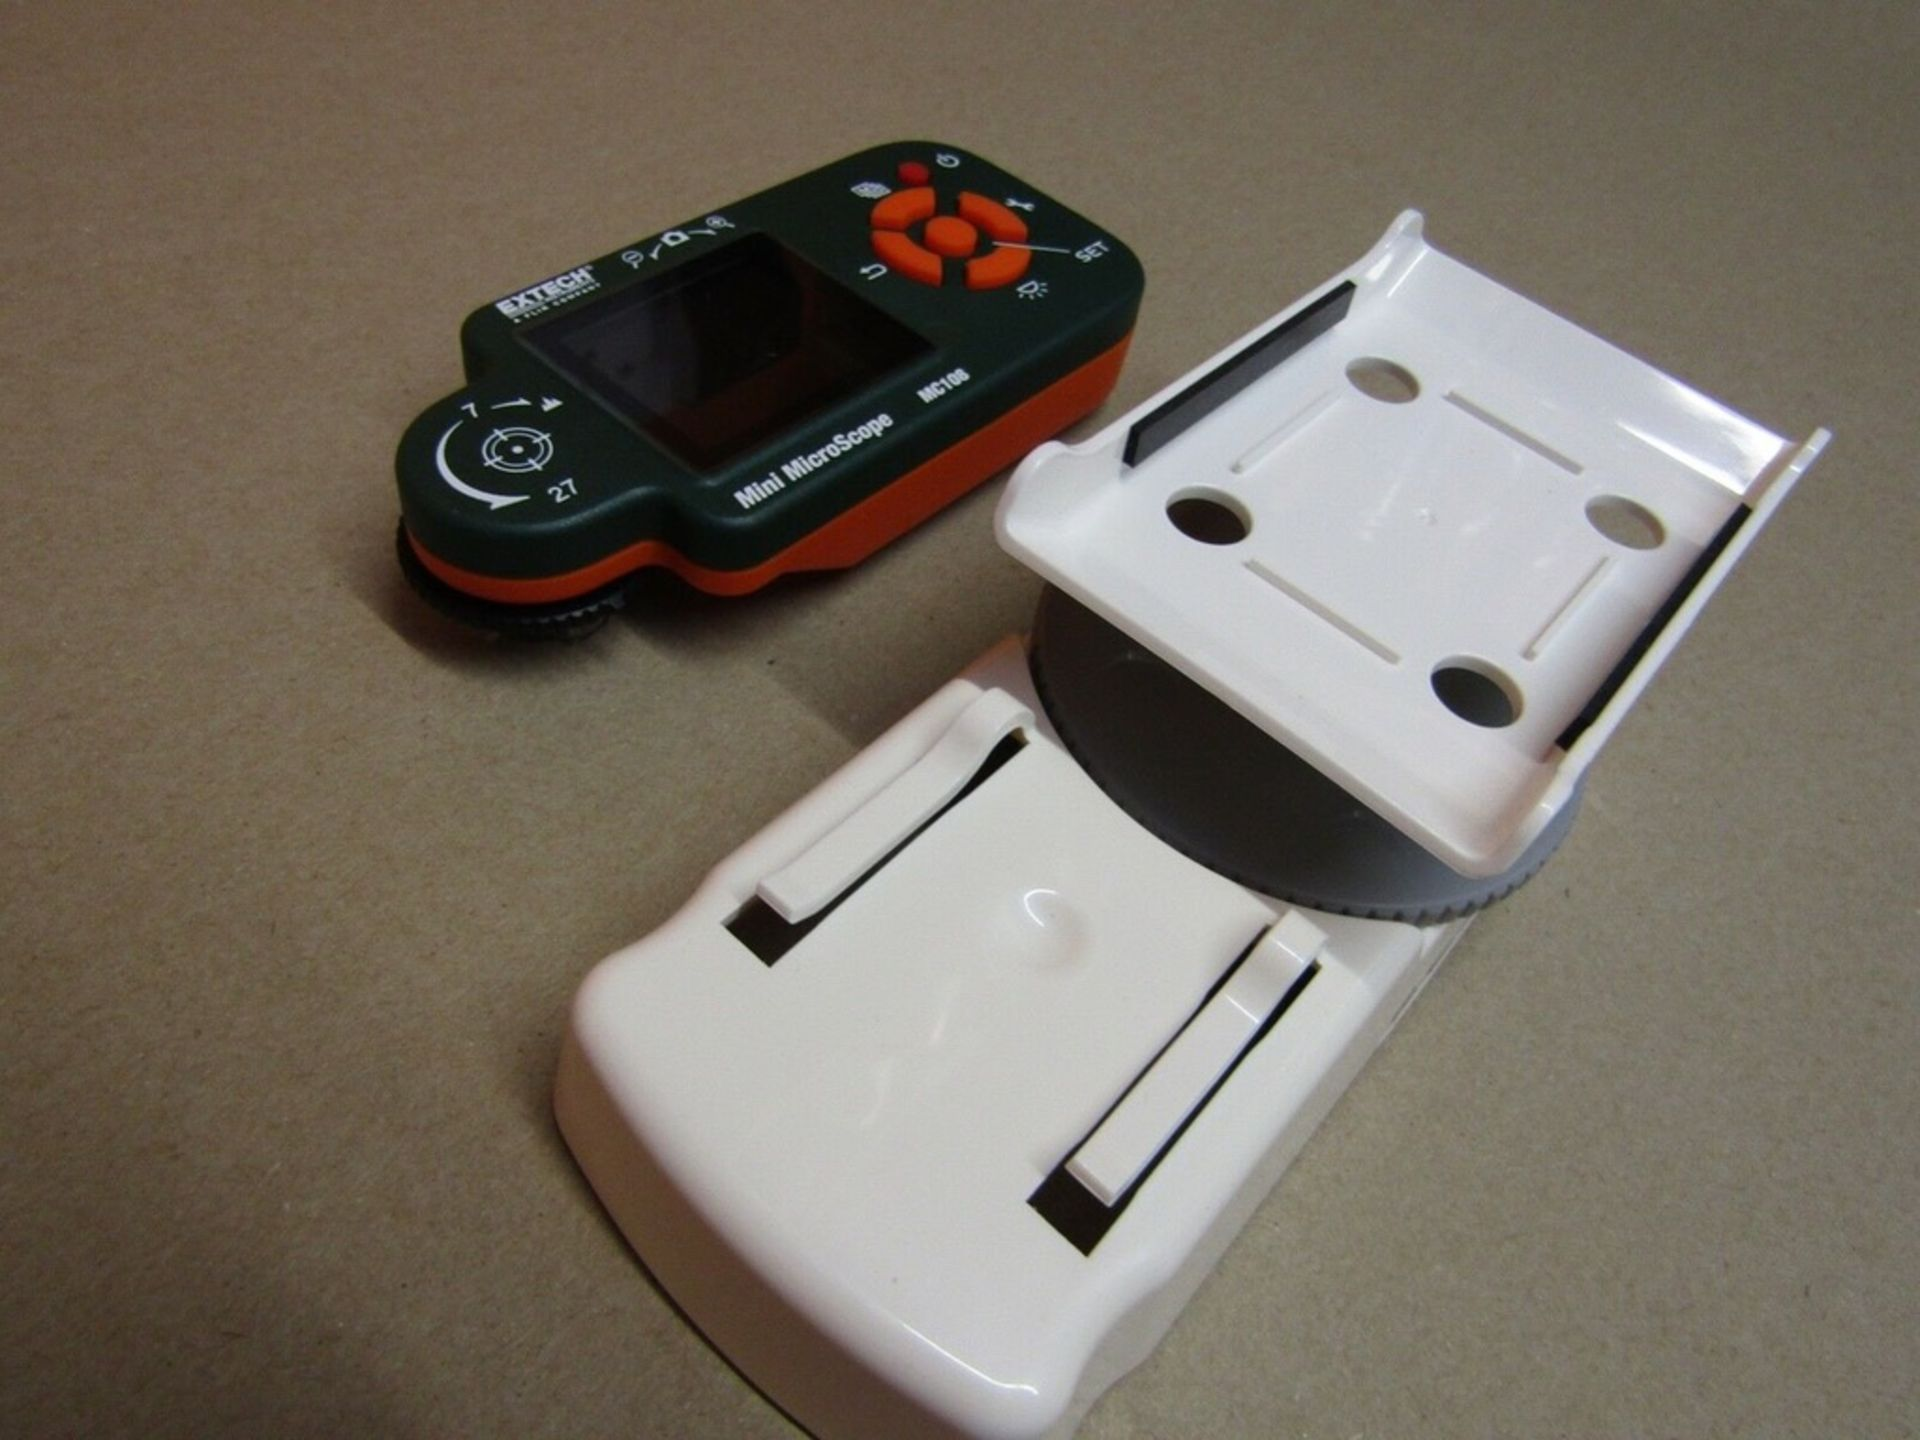 Lot 107 - Extech MC108-4 Digital Microscope